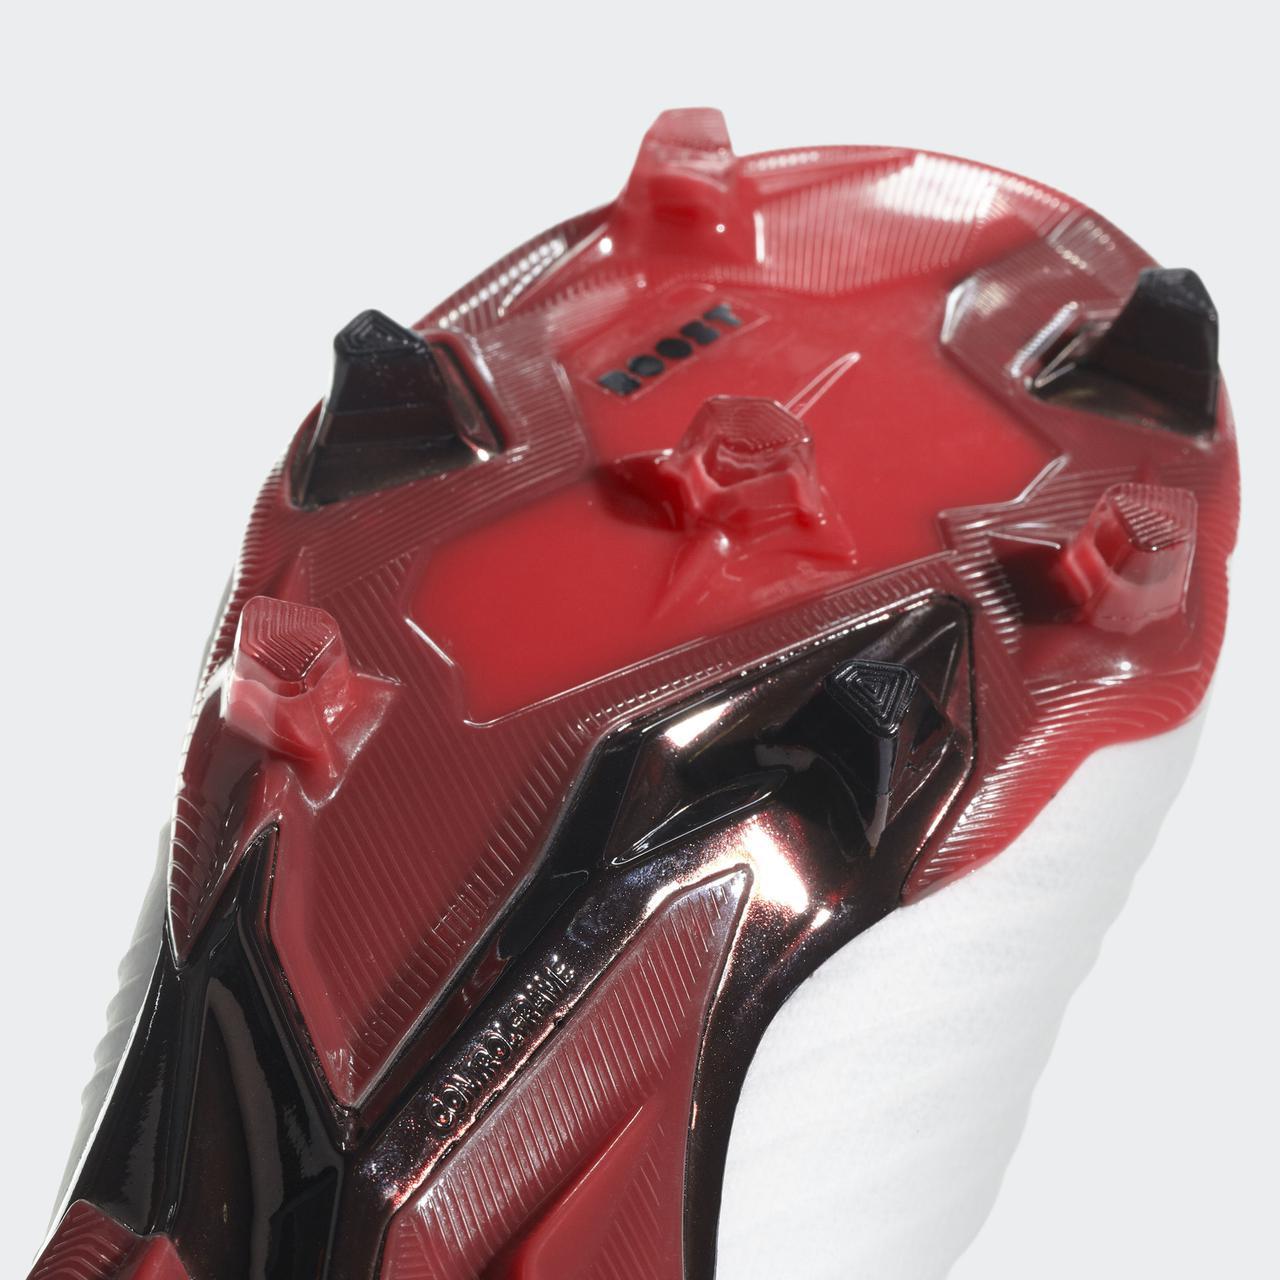 65890c02450a ... Футбольные бутсы Adidas Performance Predator 18+ FG (Артикул  CM7391),  ...